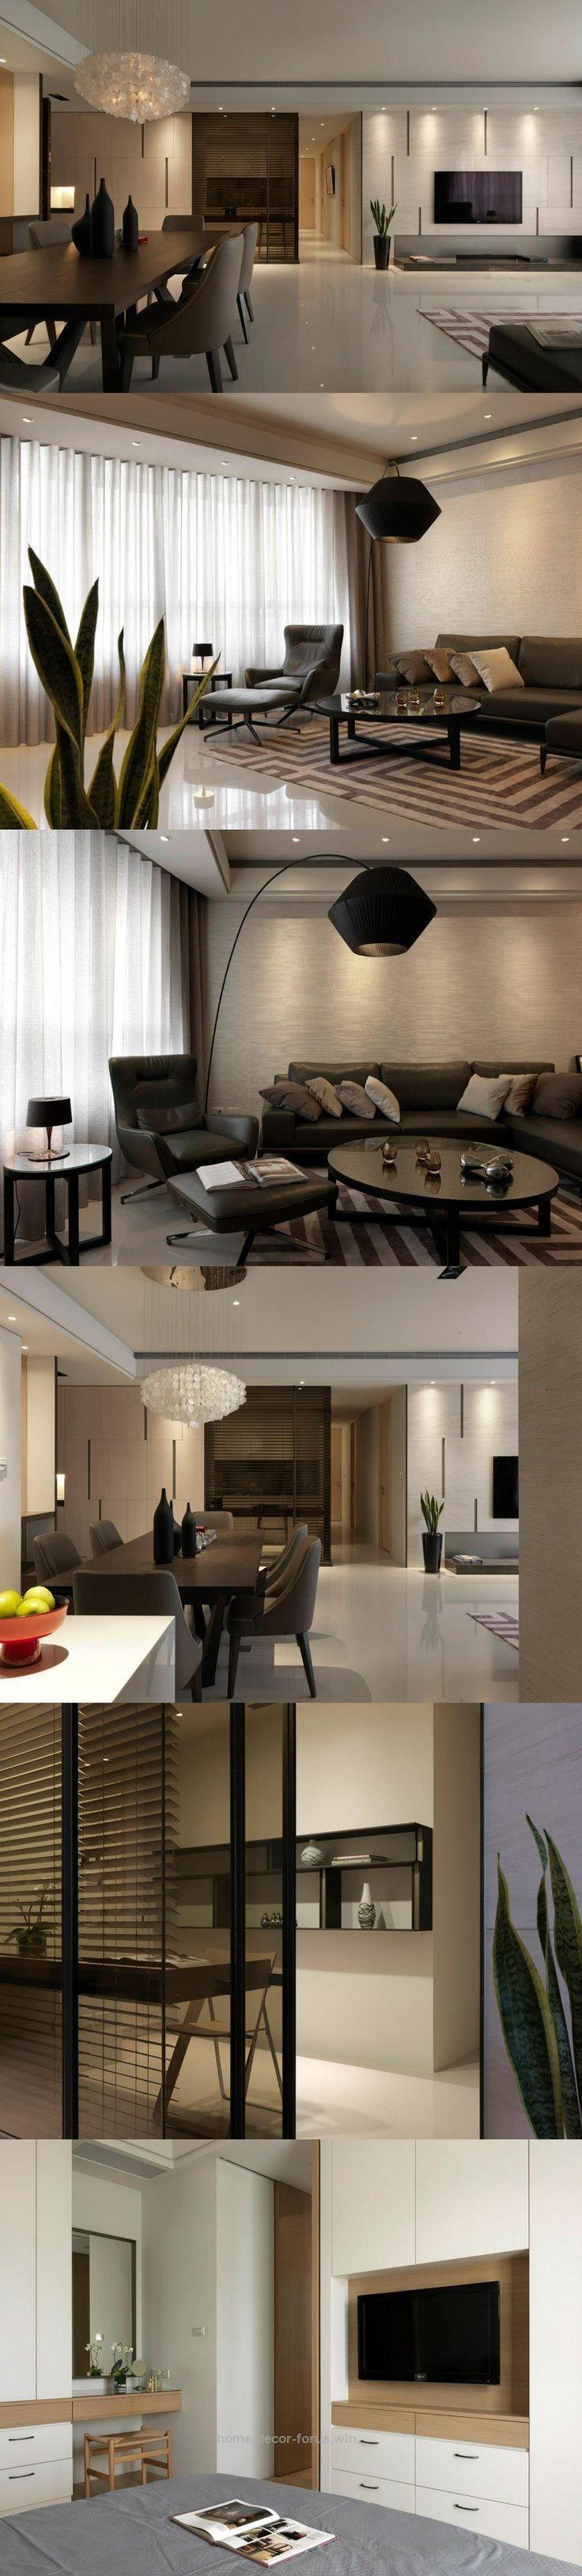 Stunning Home Interior Design In 2020 House Design Modern Interior Design Home Interior Design